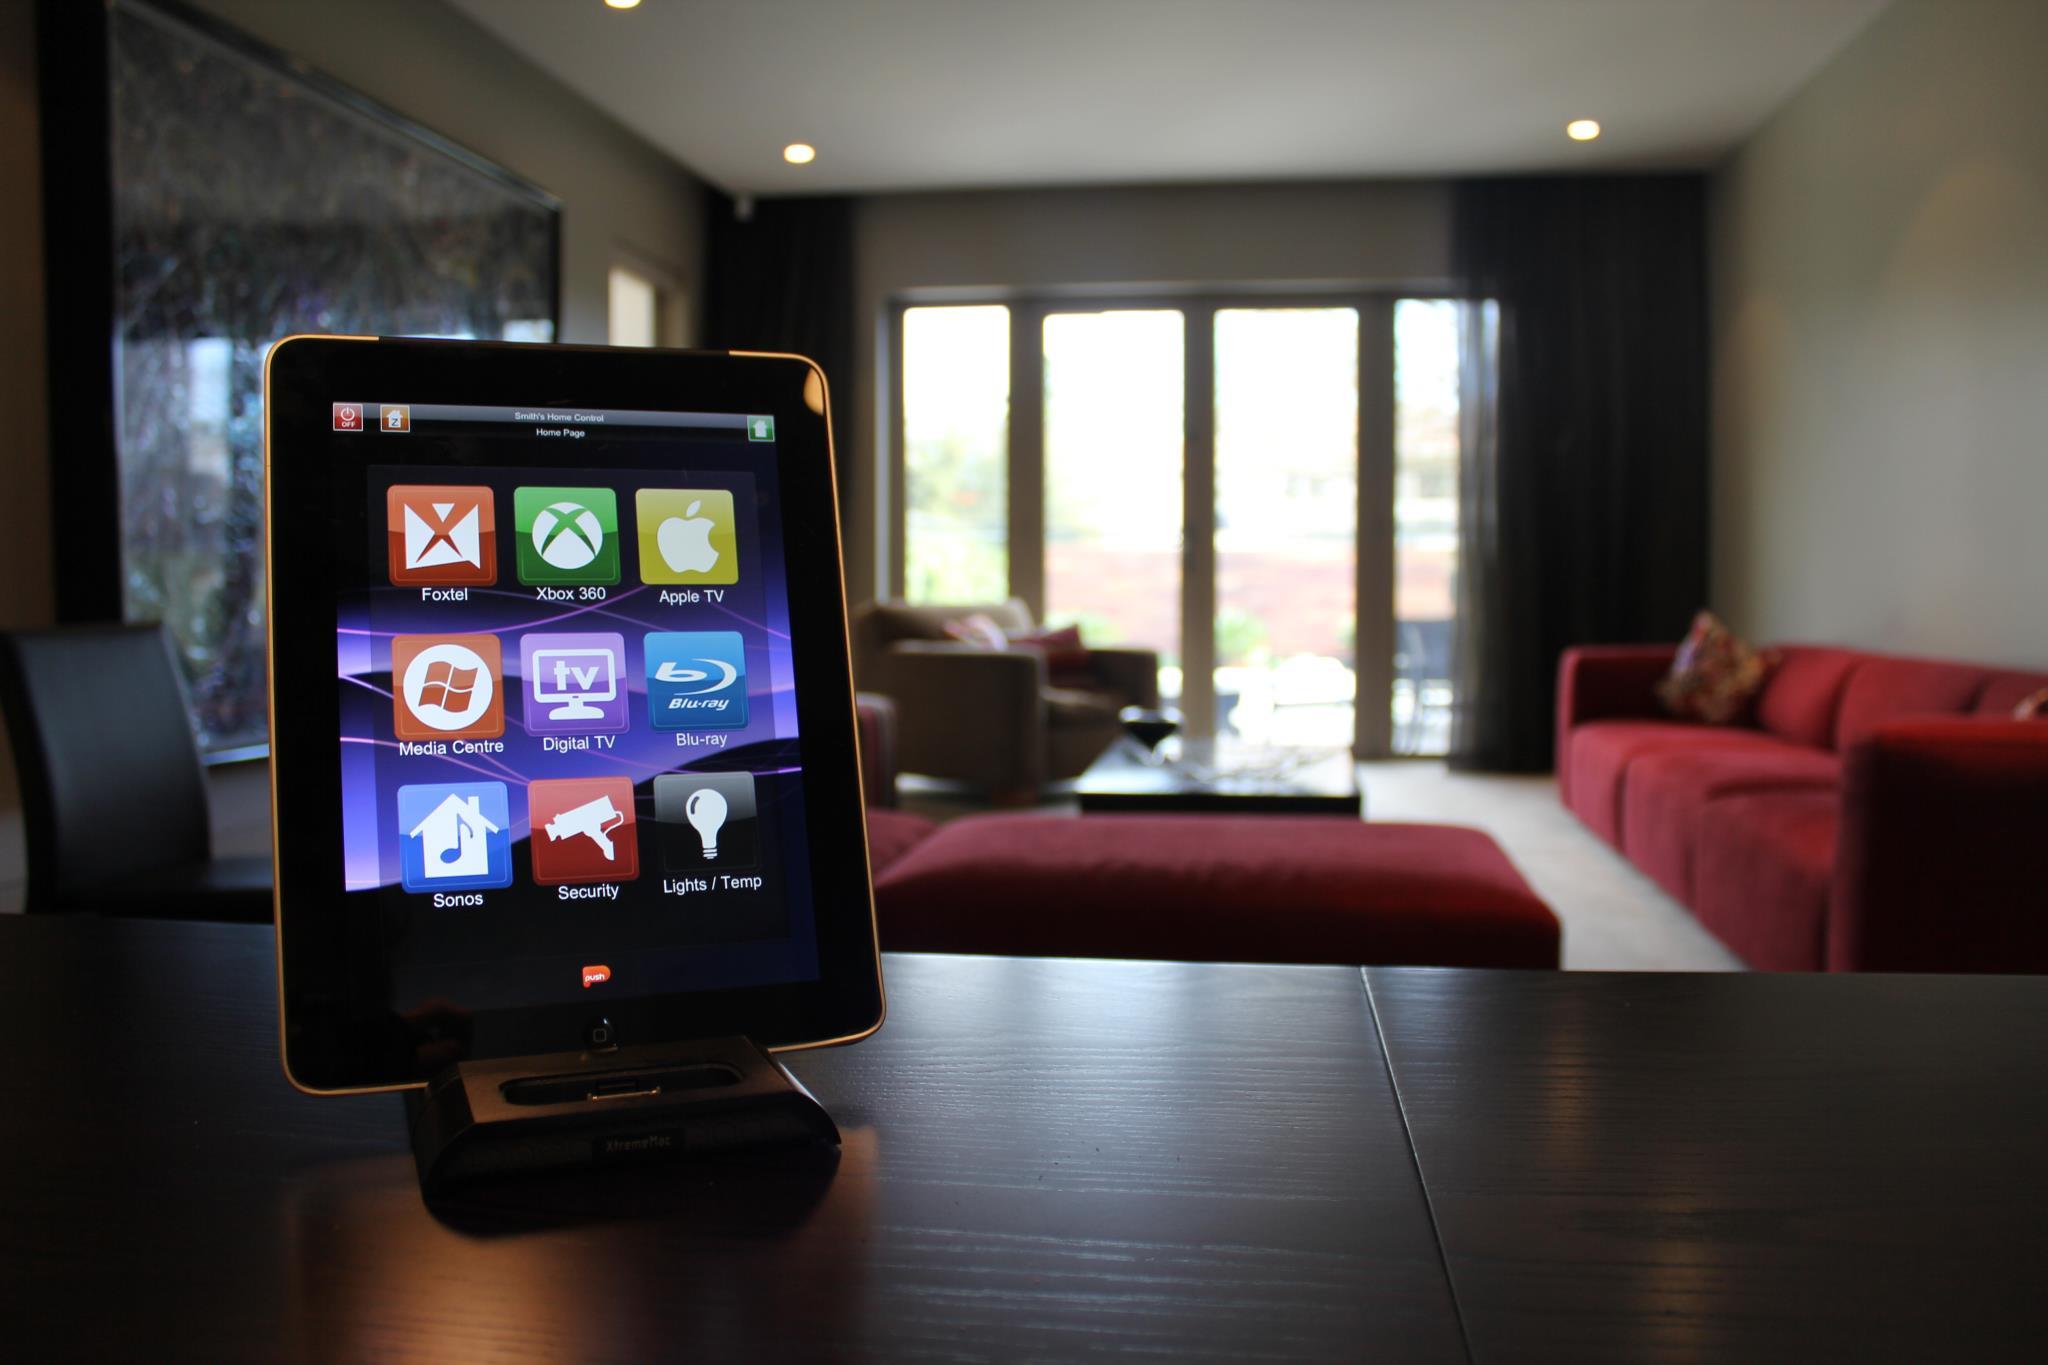 iPad Home Control and iPad Home Automation